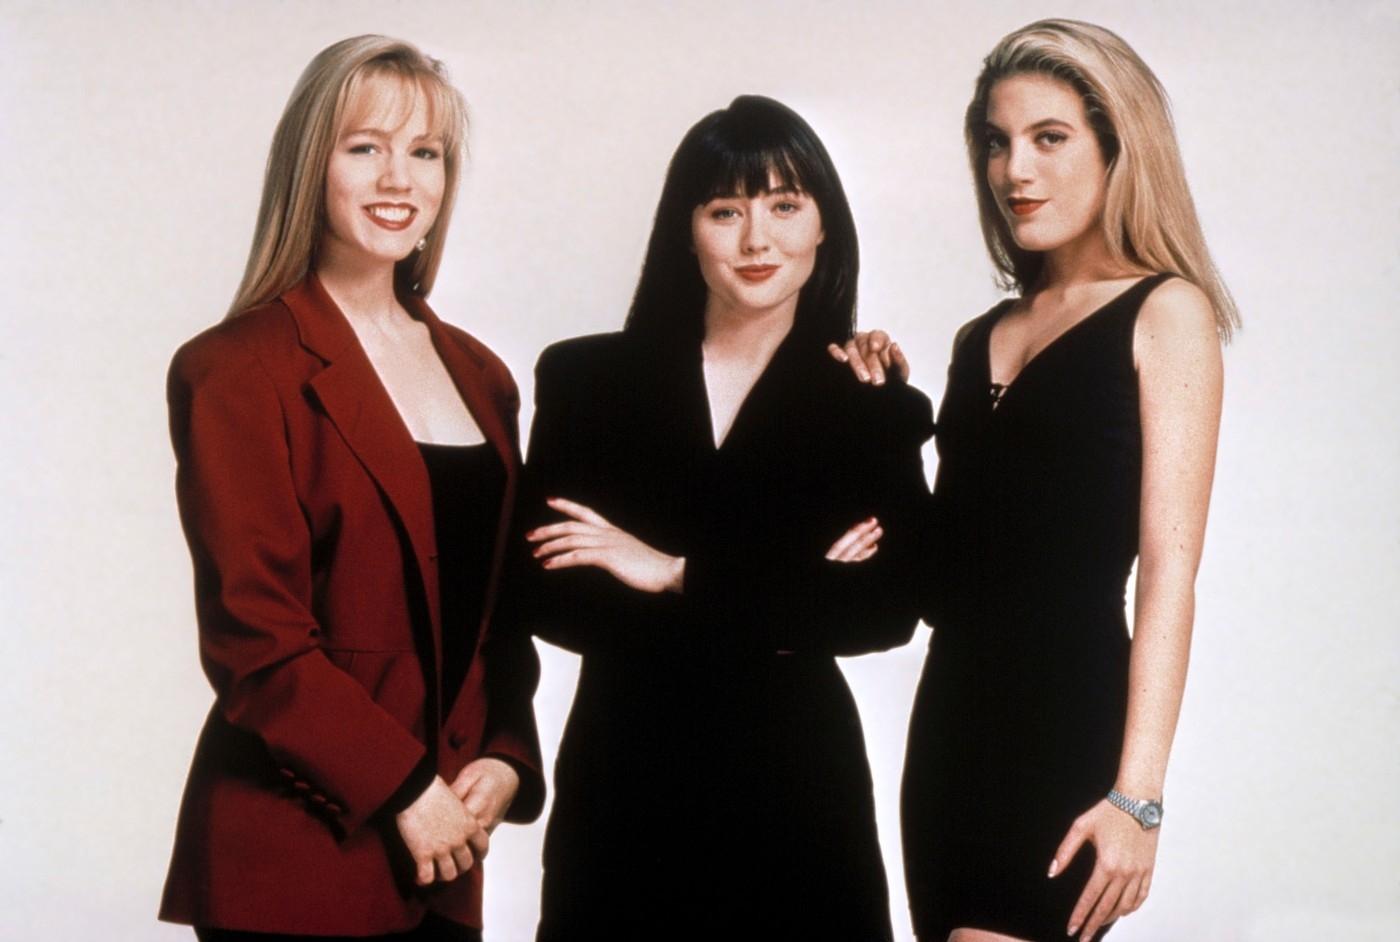 Kelly, Brenda, Donna z Beverly Hills 90210